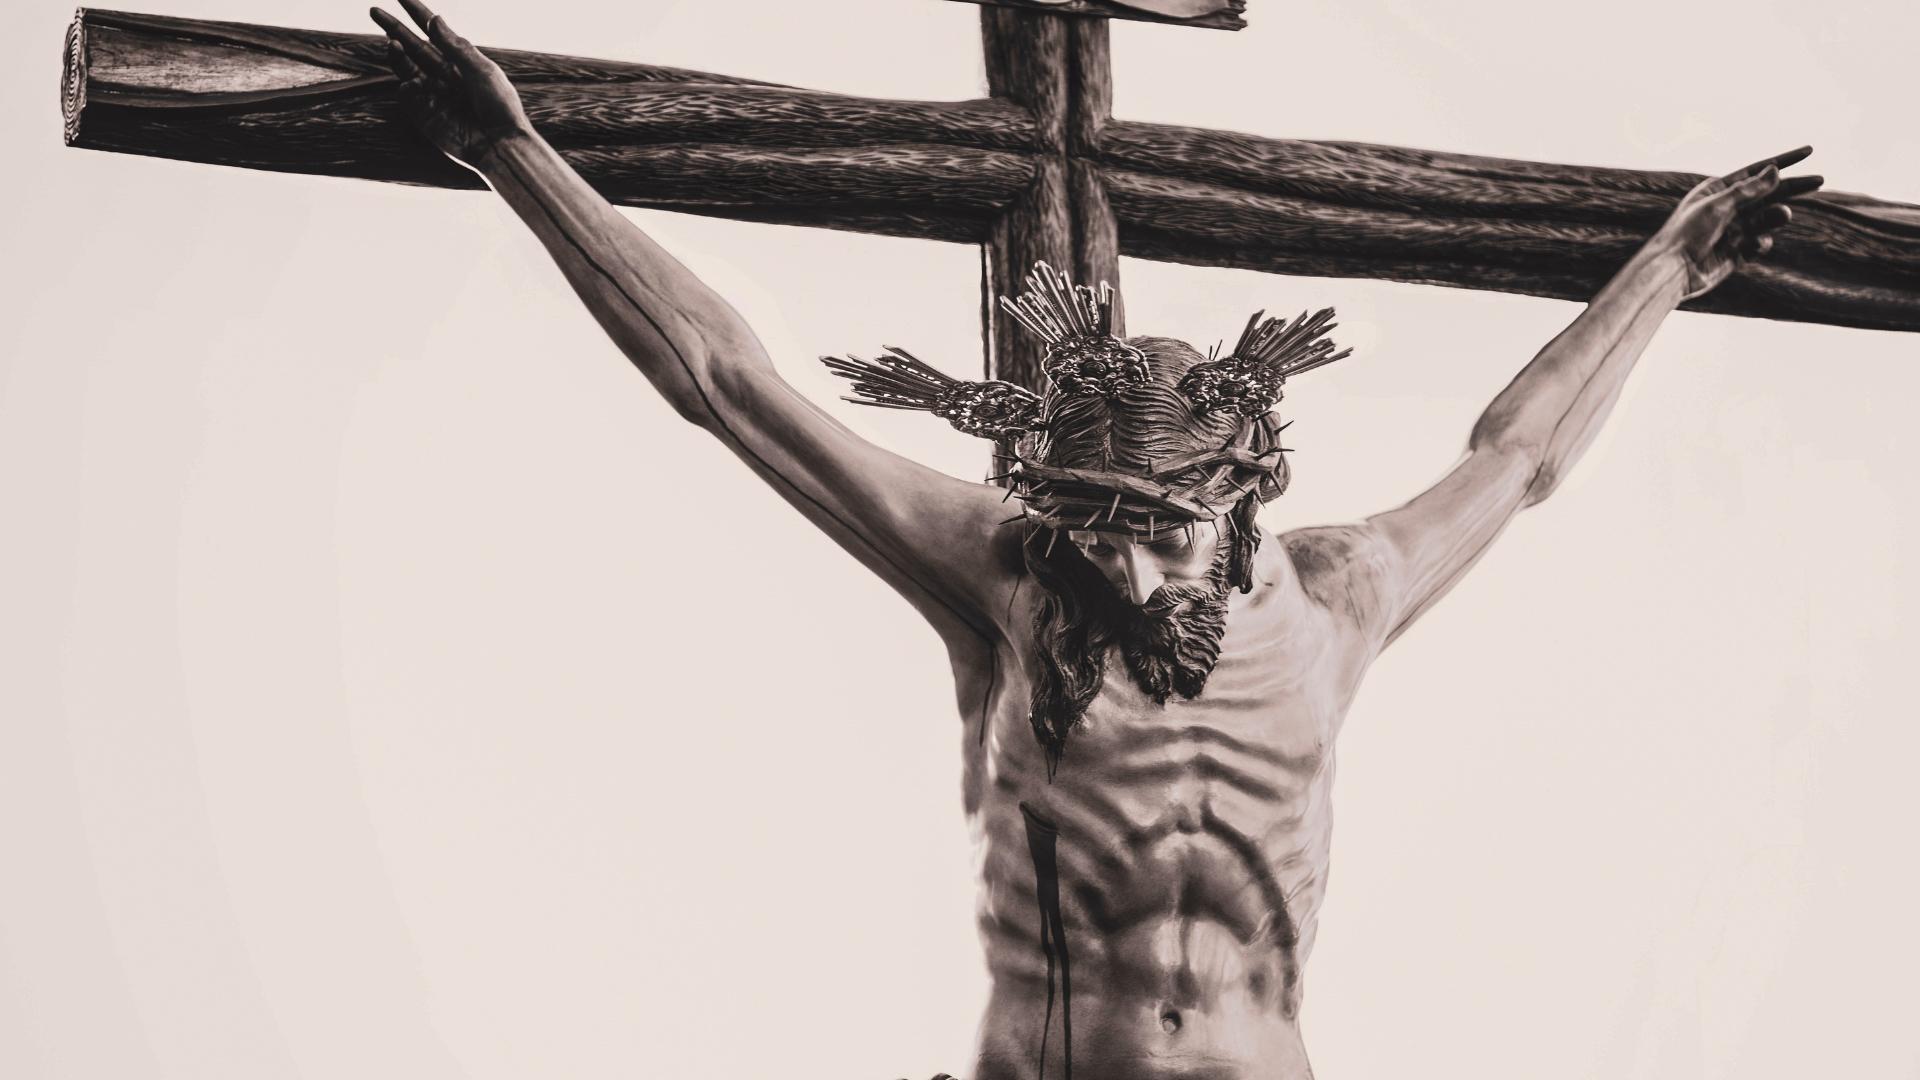 Important Holy Week & Easter Reminders